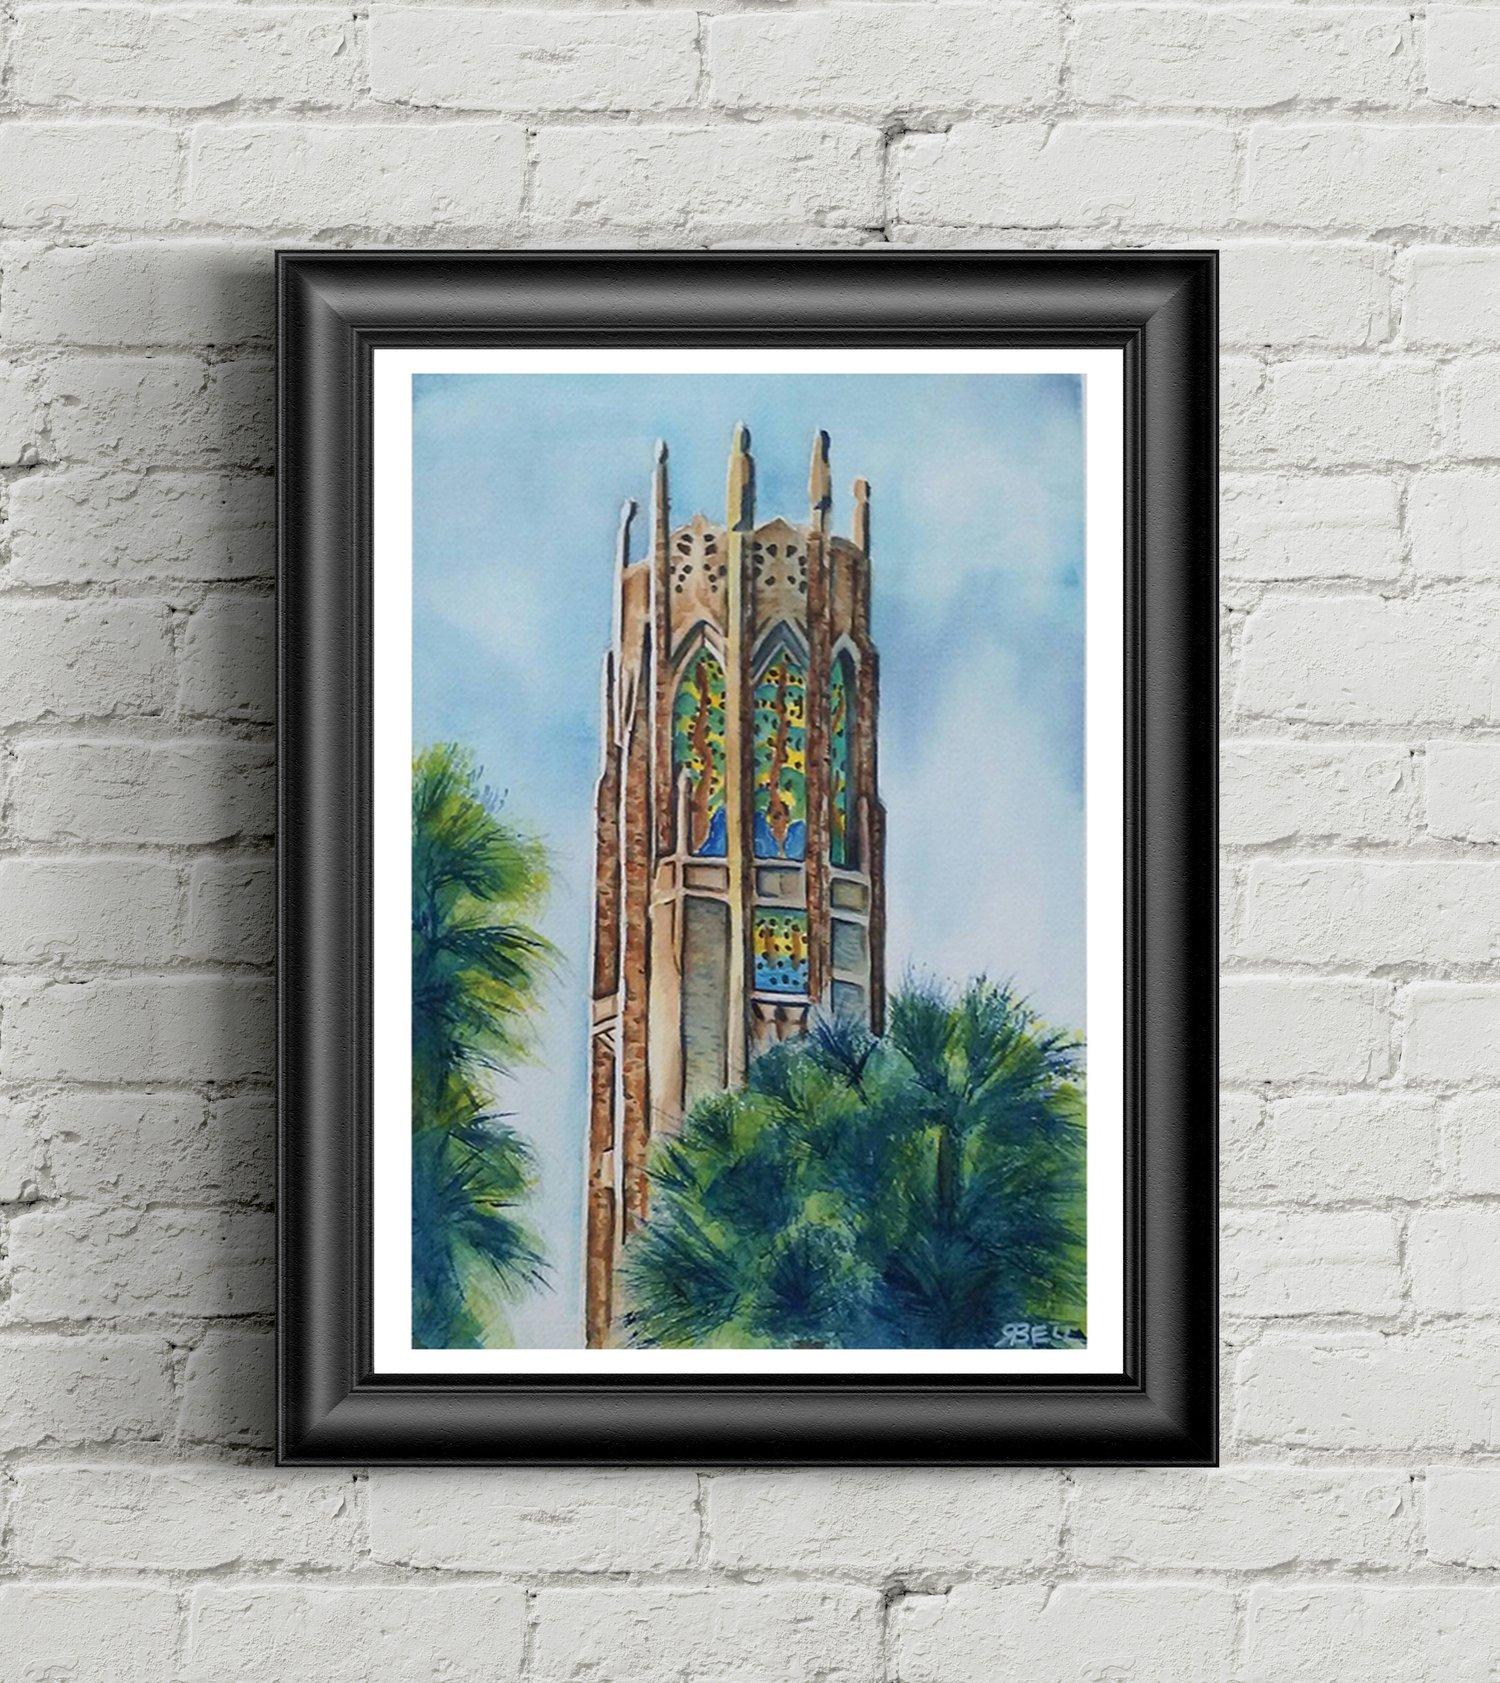 Image of Bok Tower 8x10 print